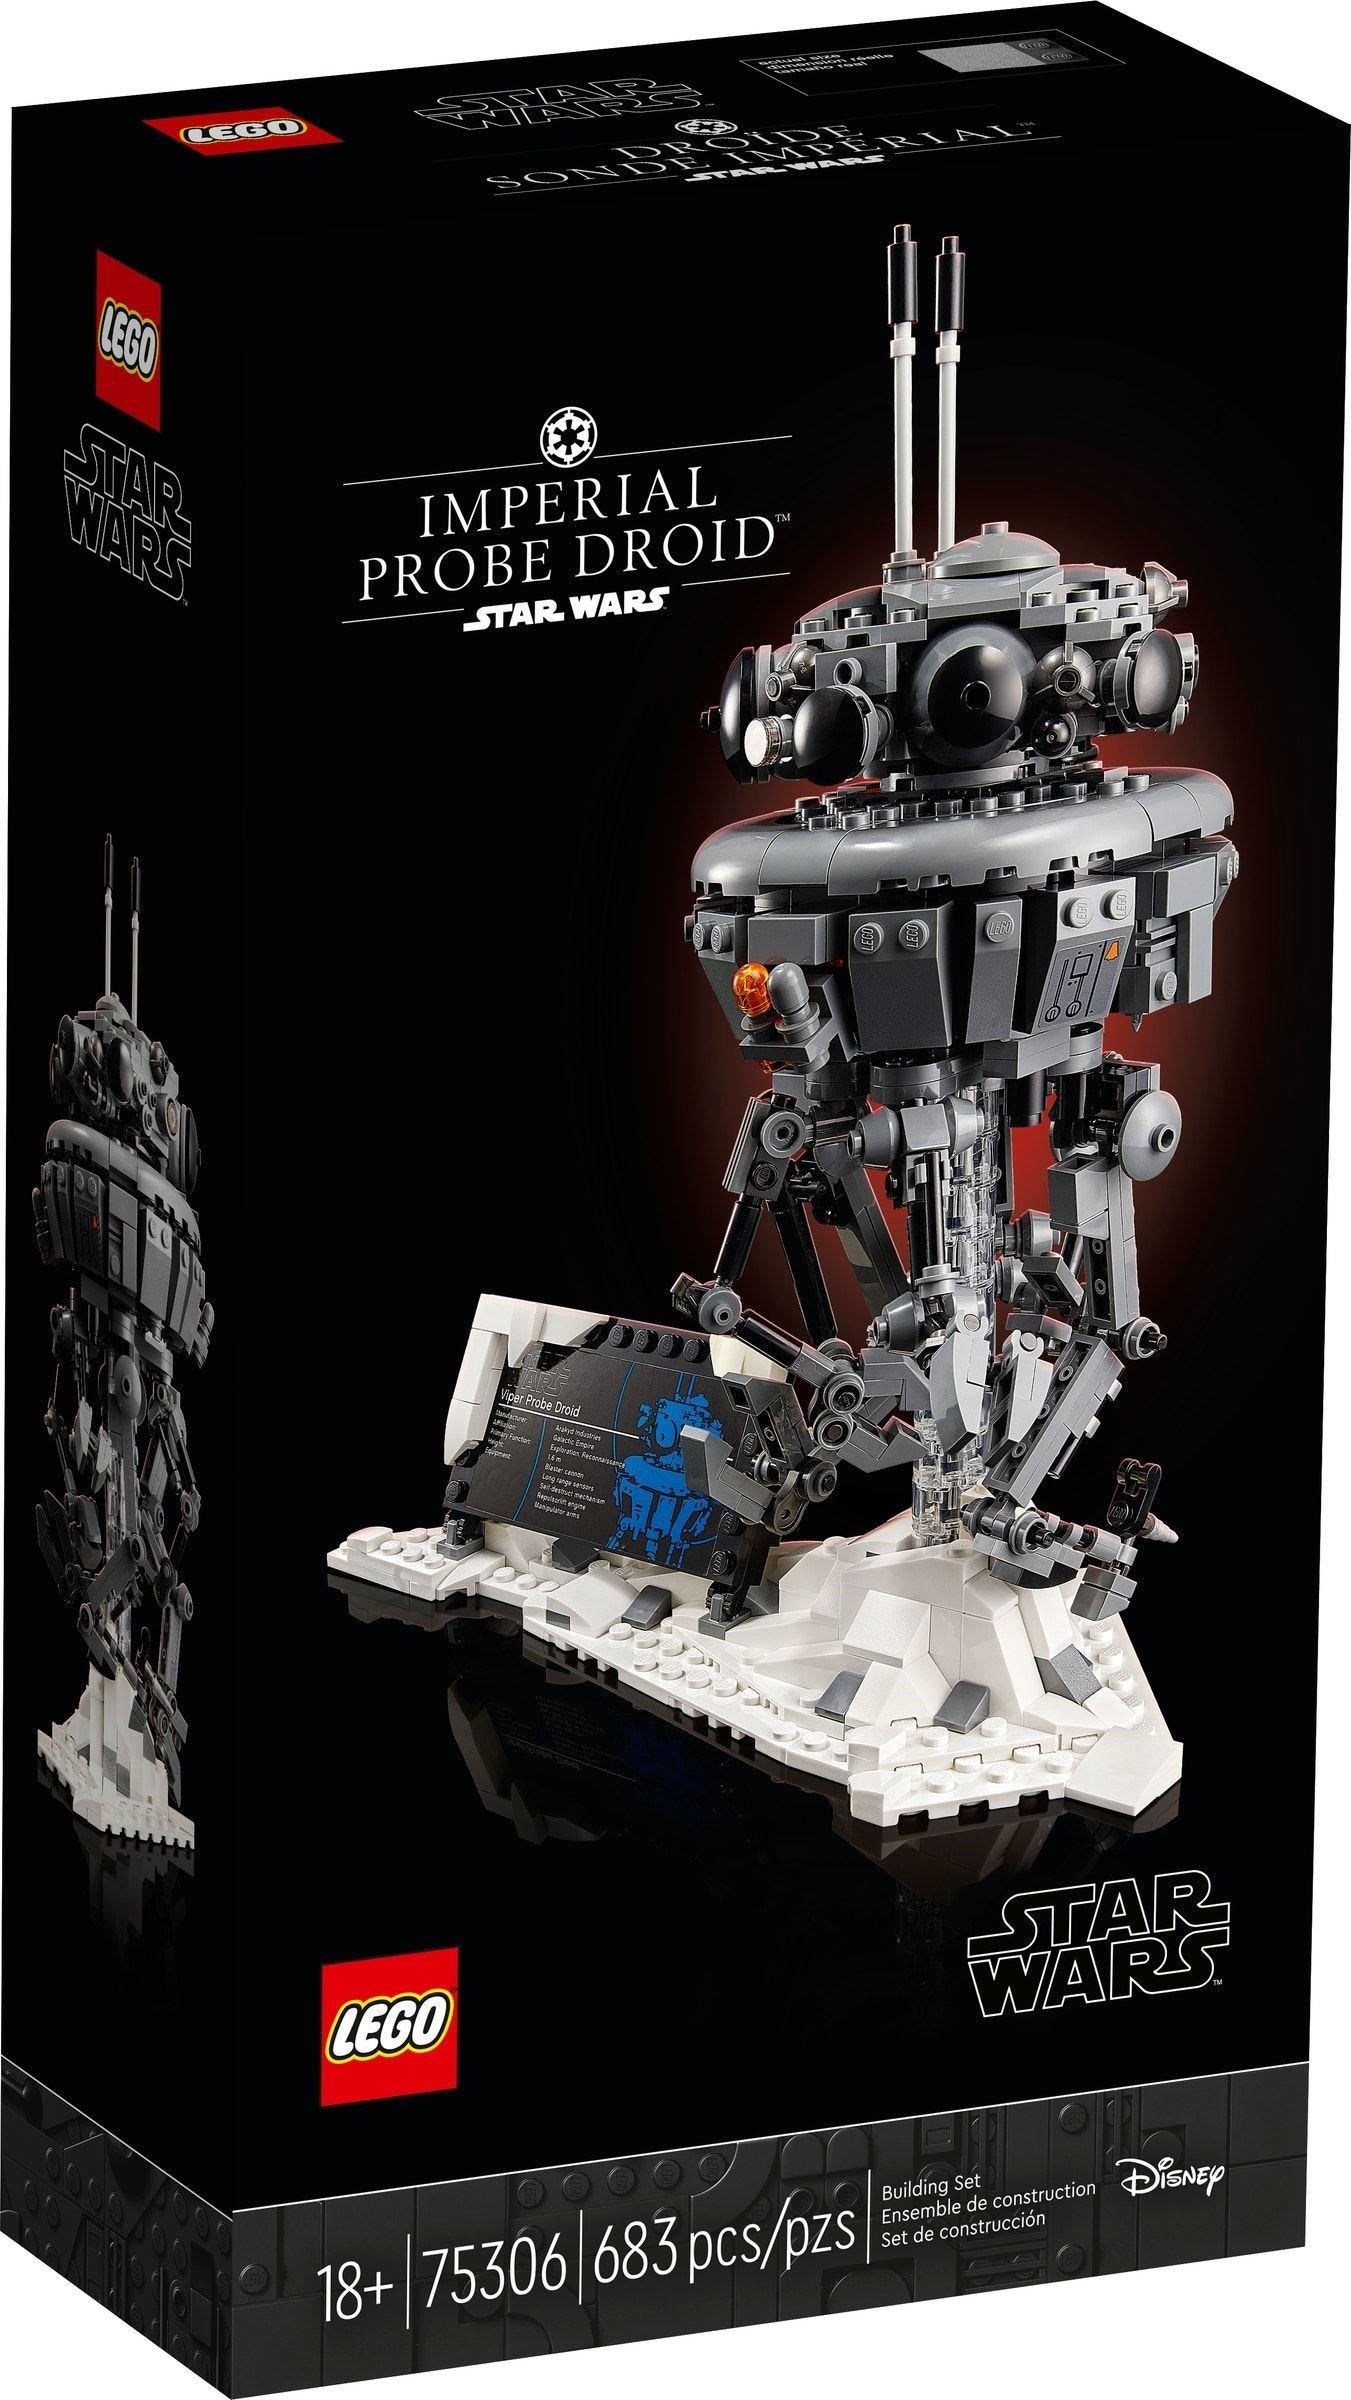 LEGO Star Wars - Imperial Probe Droid (75306)